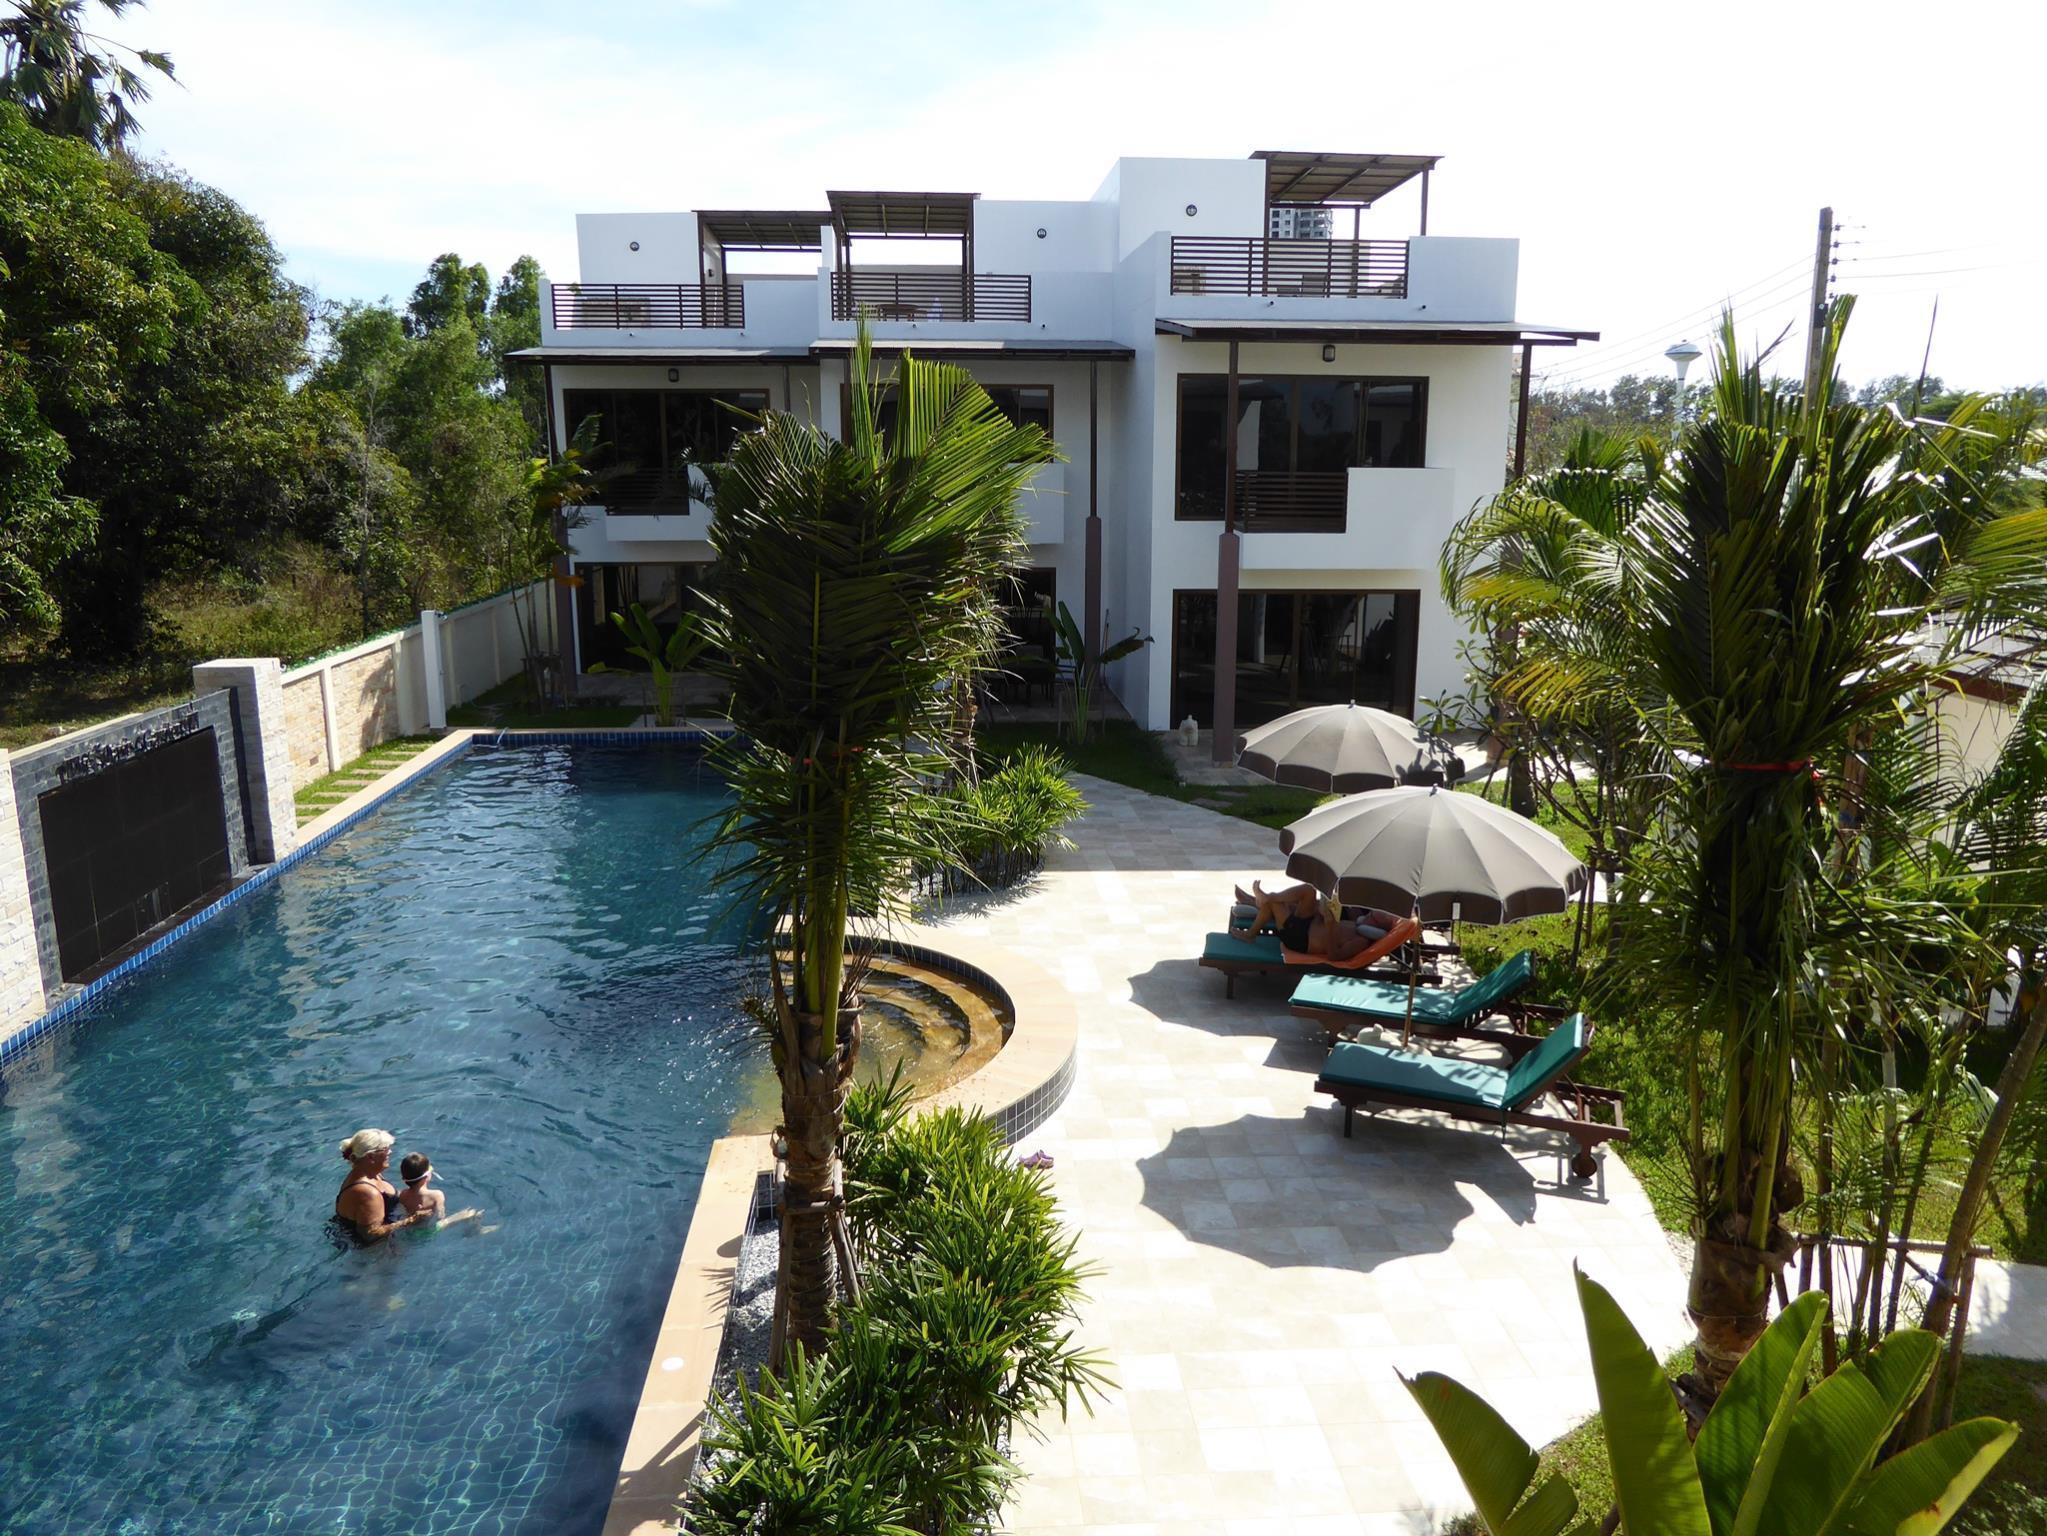 Oasis Garden and Pool Villa at VIP Chain Resort,โอเอซิส การ์เดน แอนด์ พูล วิลลา แอท วีไอพี เชน รีสอร์ต